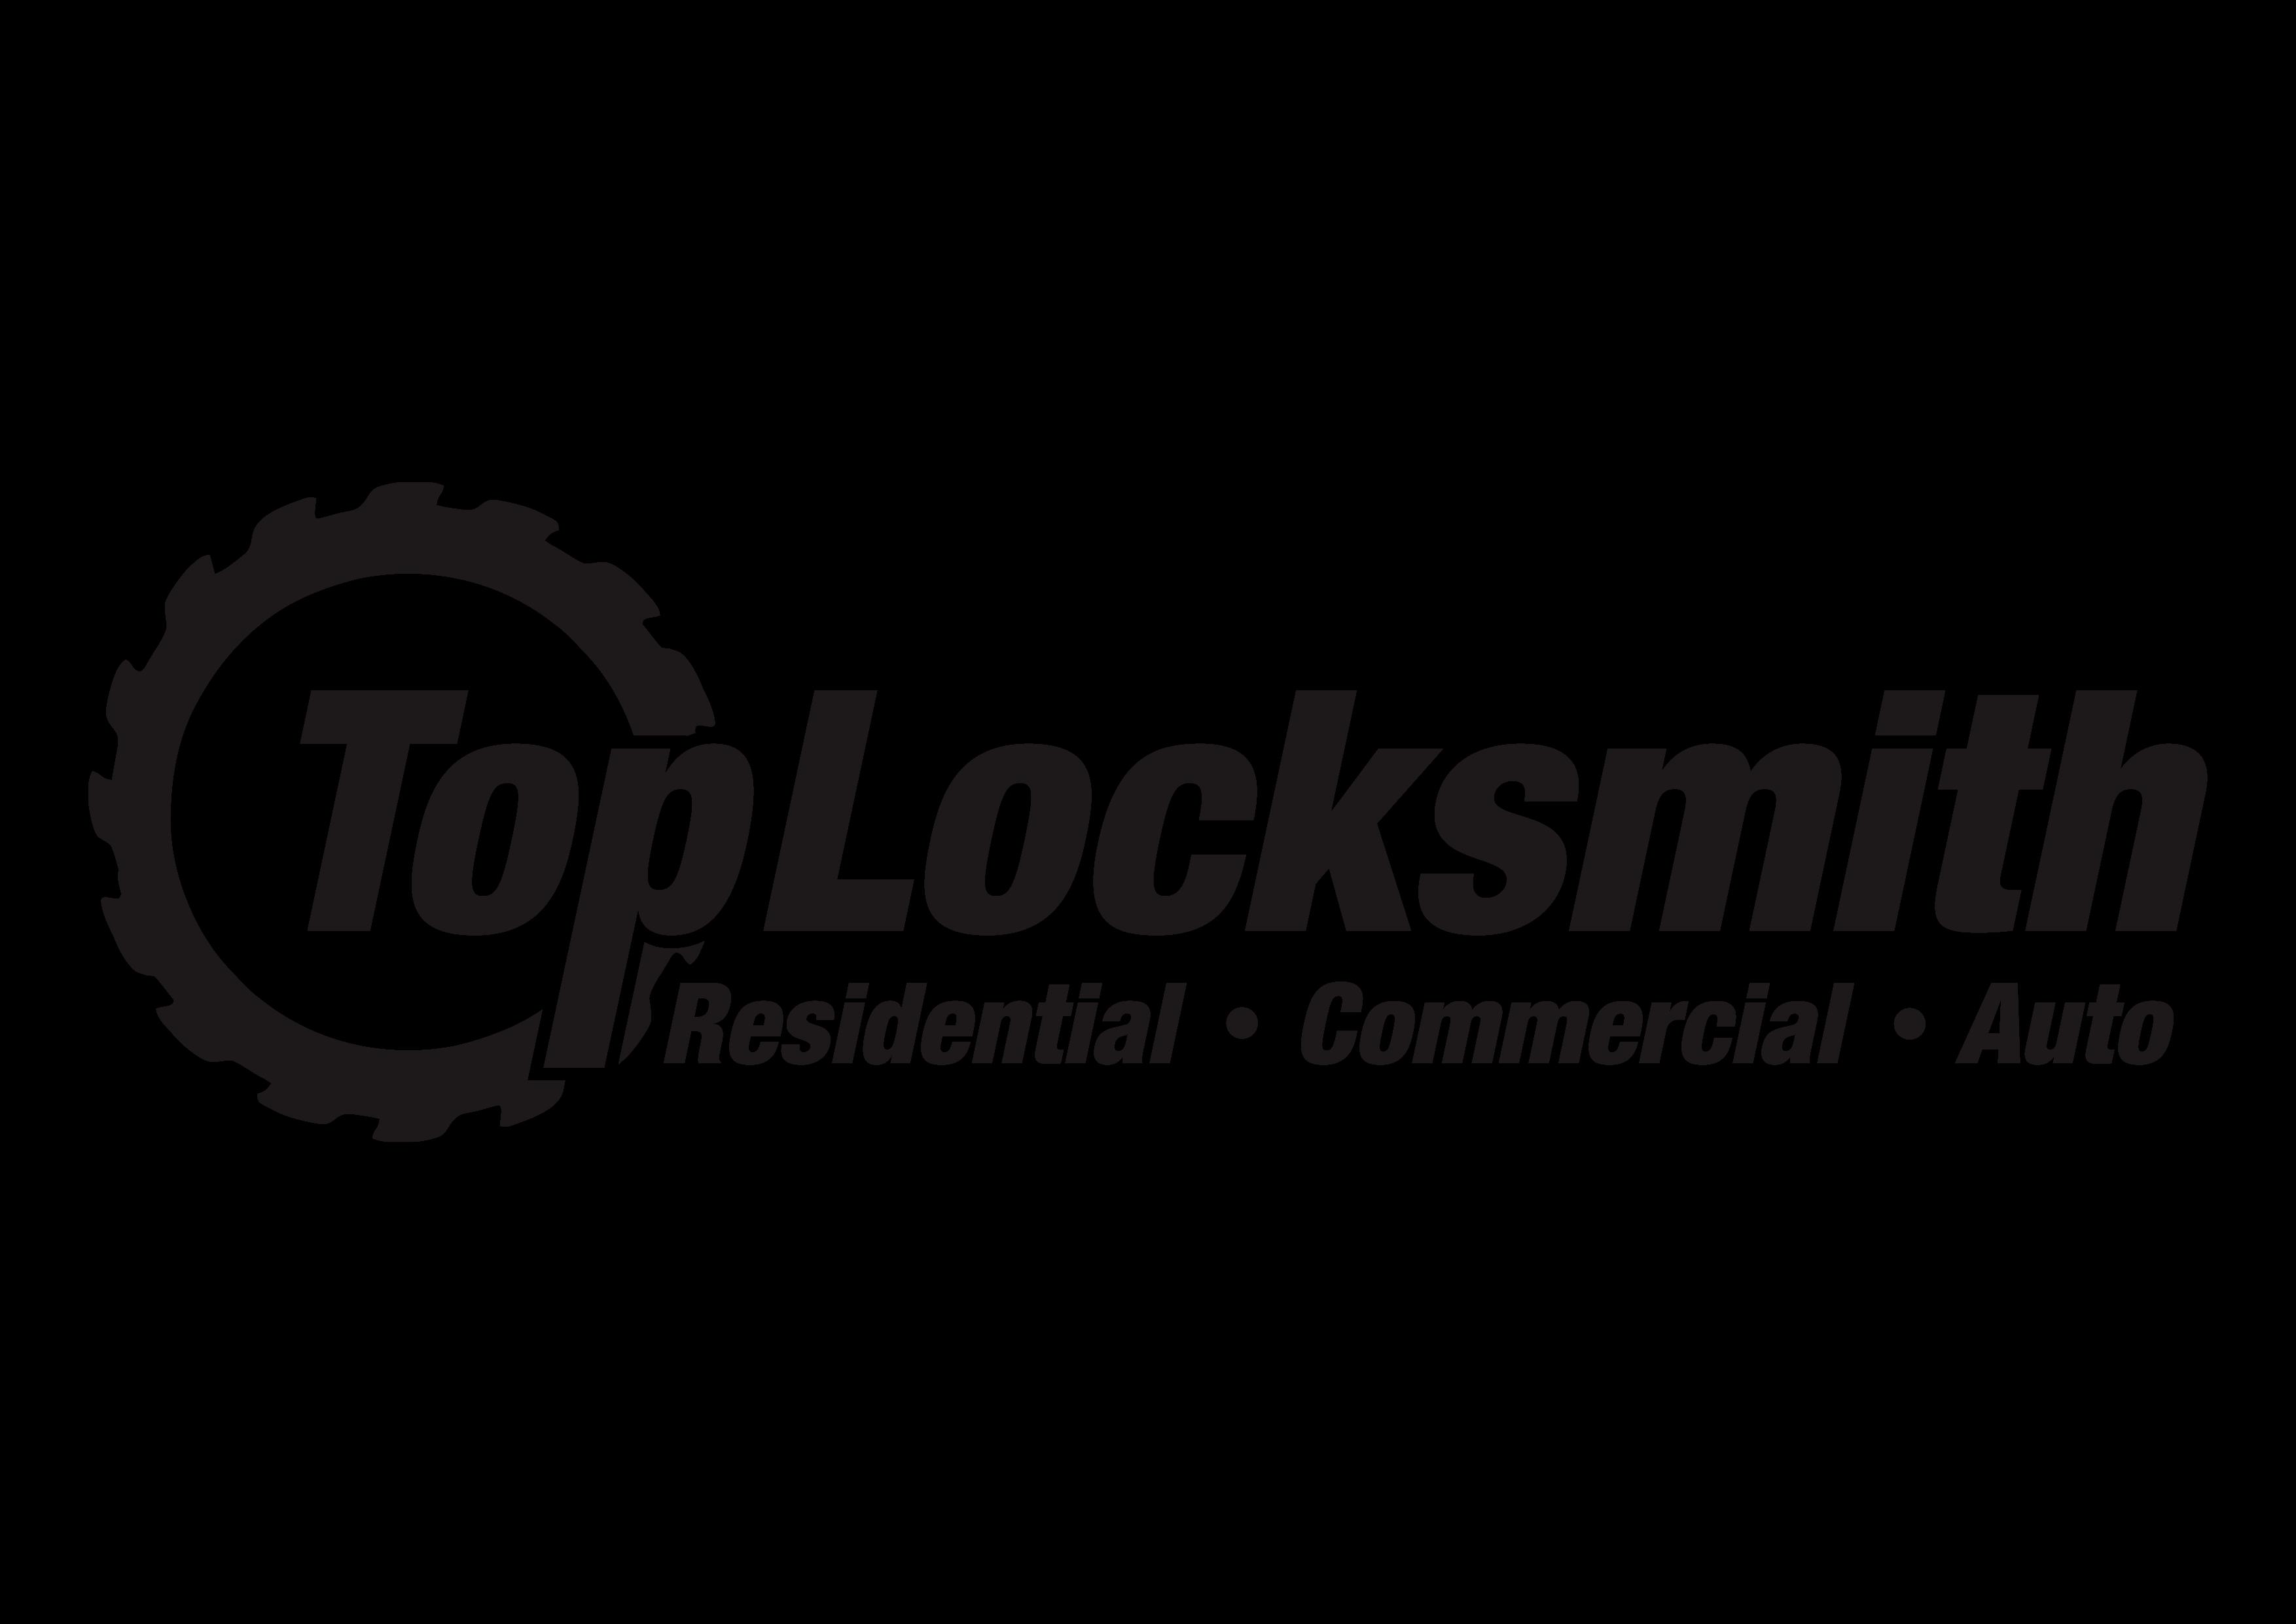 Top Locksmith